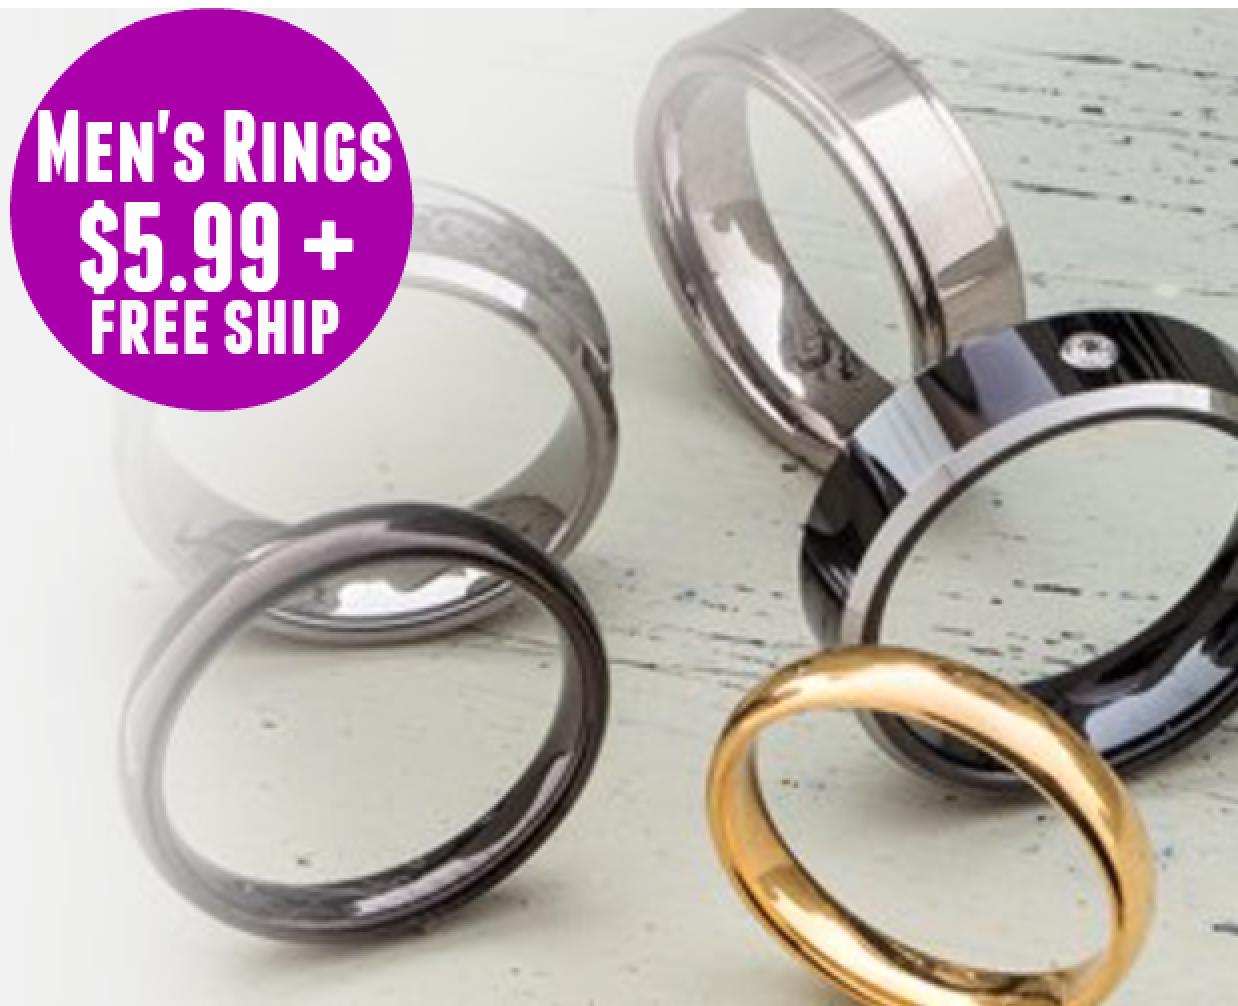 http://www.thebinderladies.com/2014/11/hot-tanga-mens-stainless-steel-rings.html